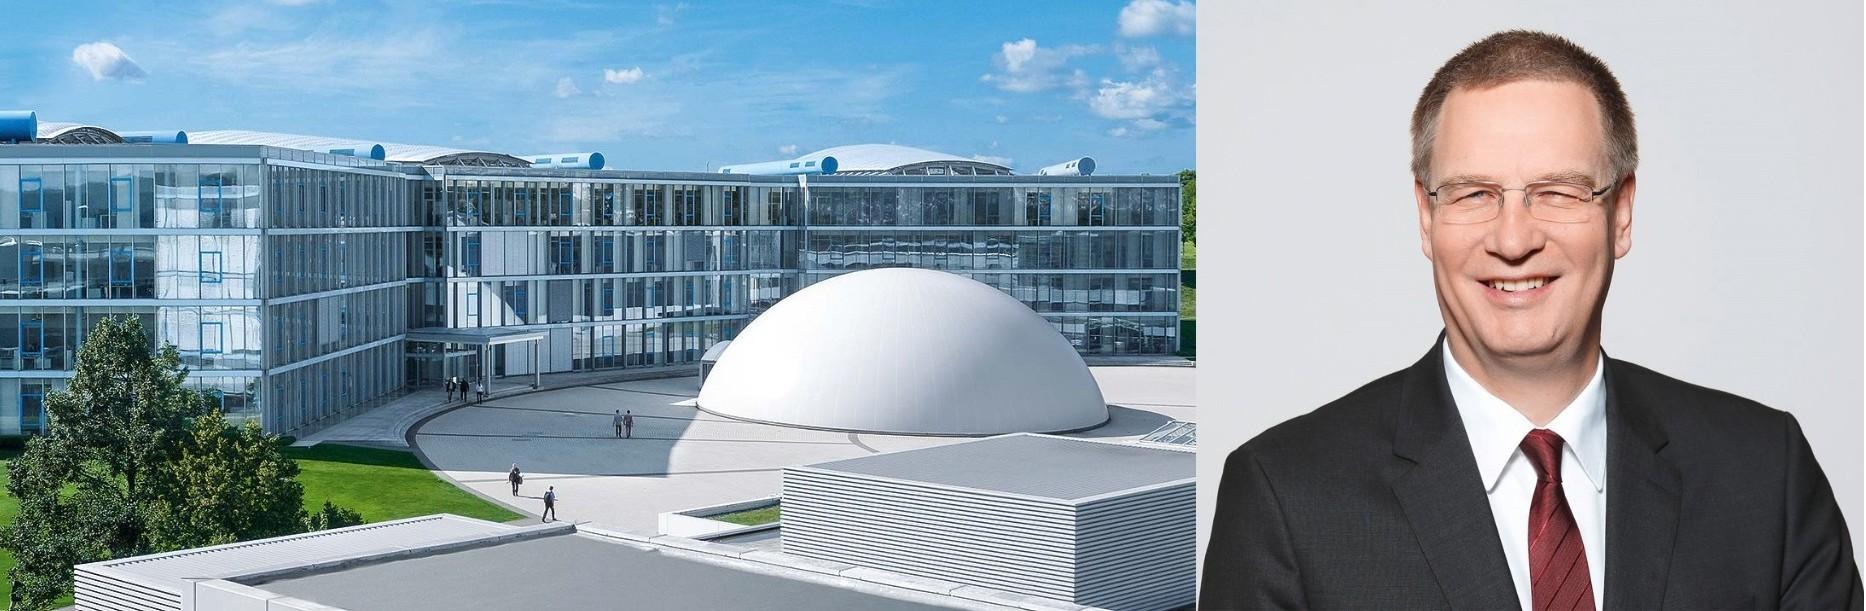 Festo AG, Oliver Jung nuovo presidente